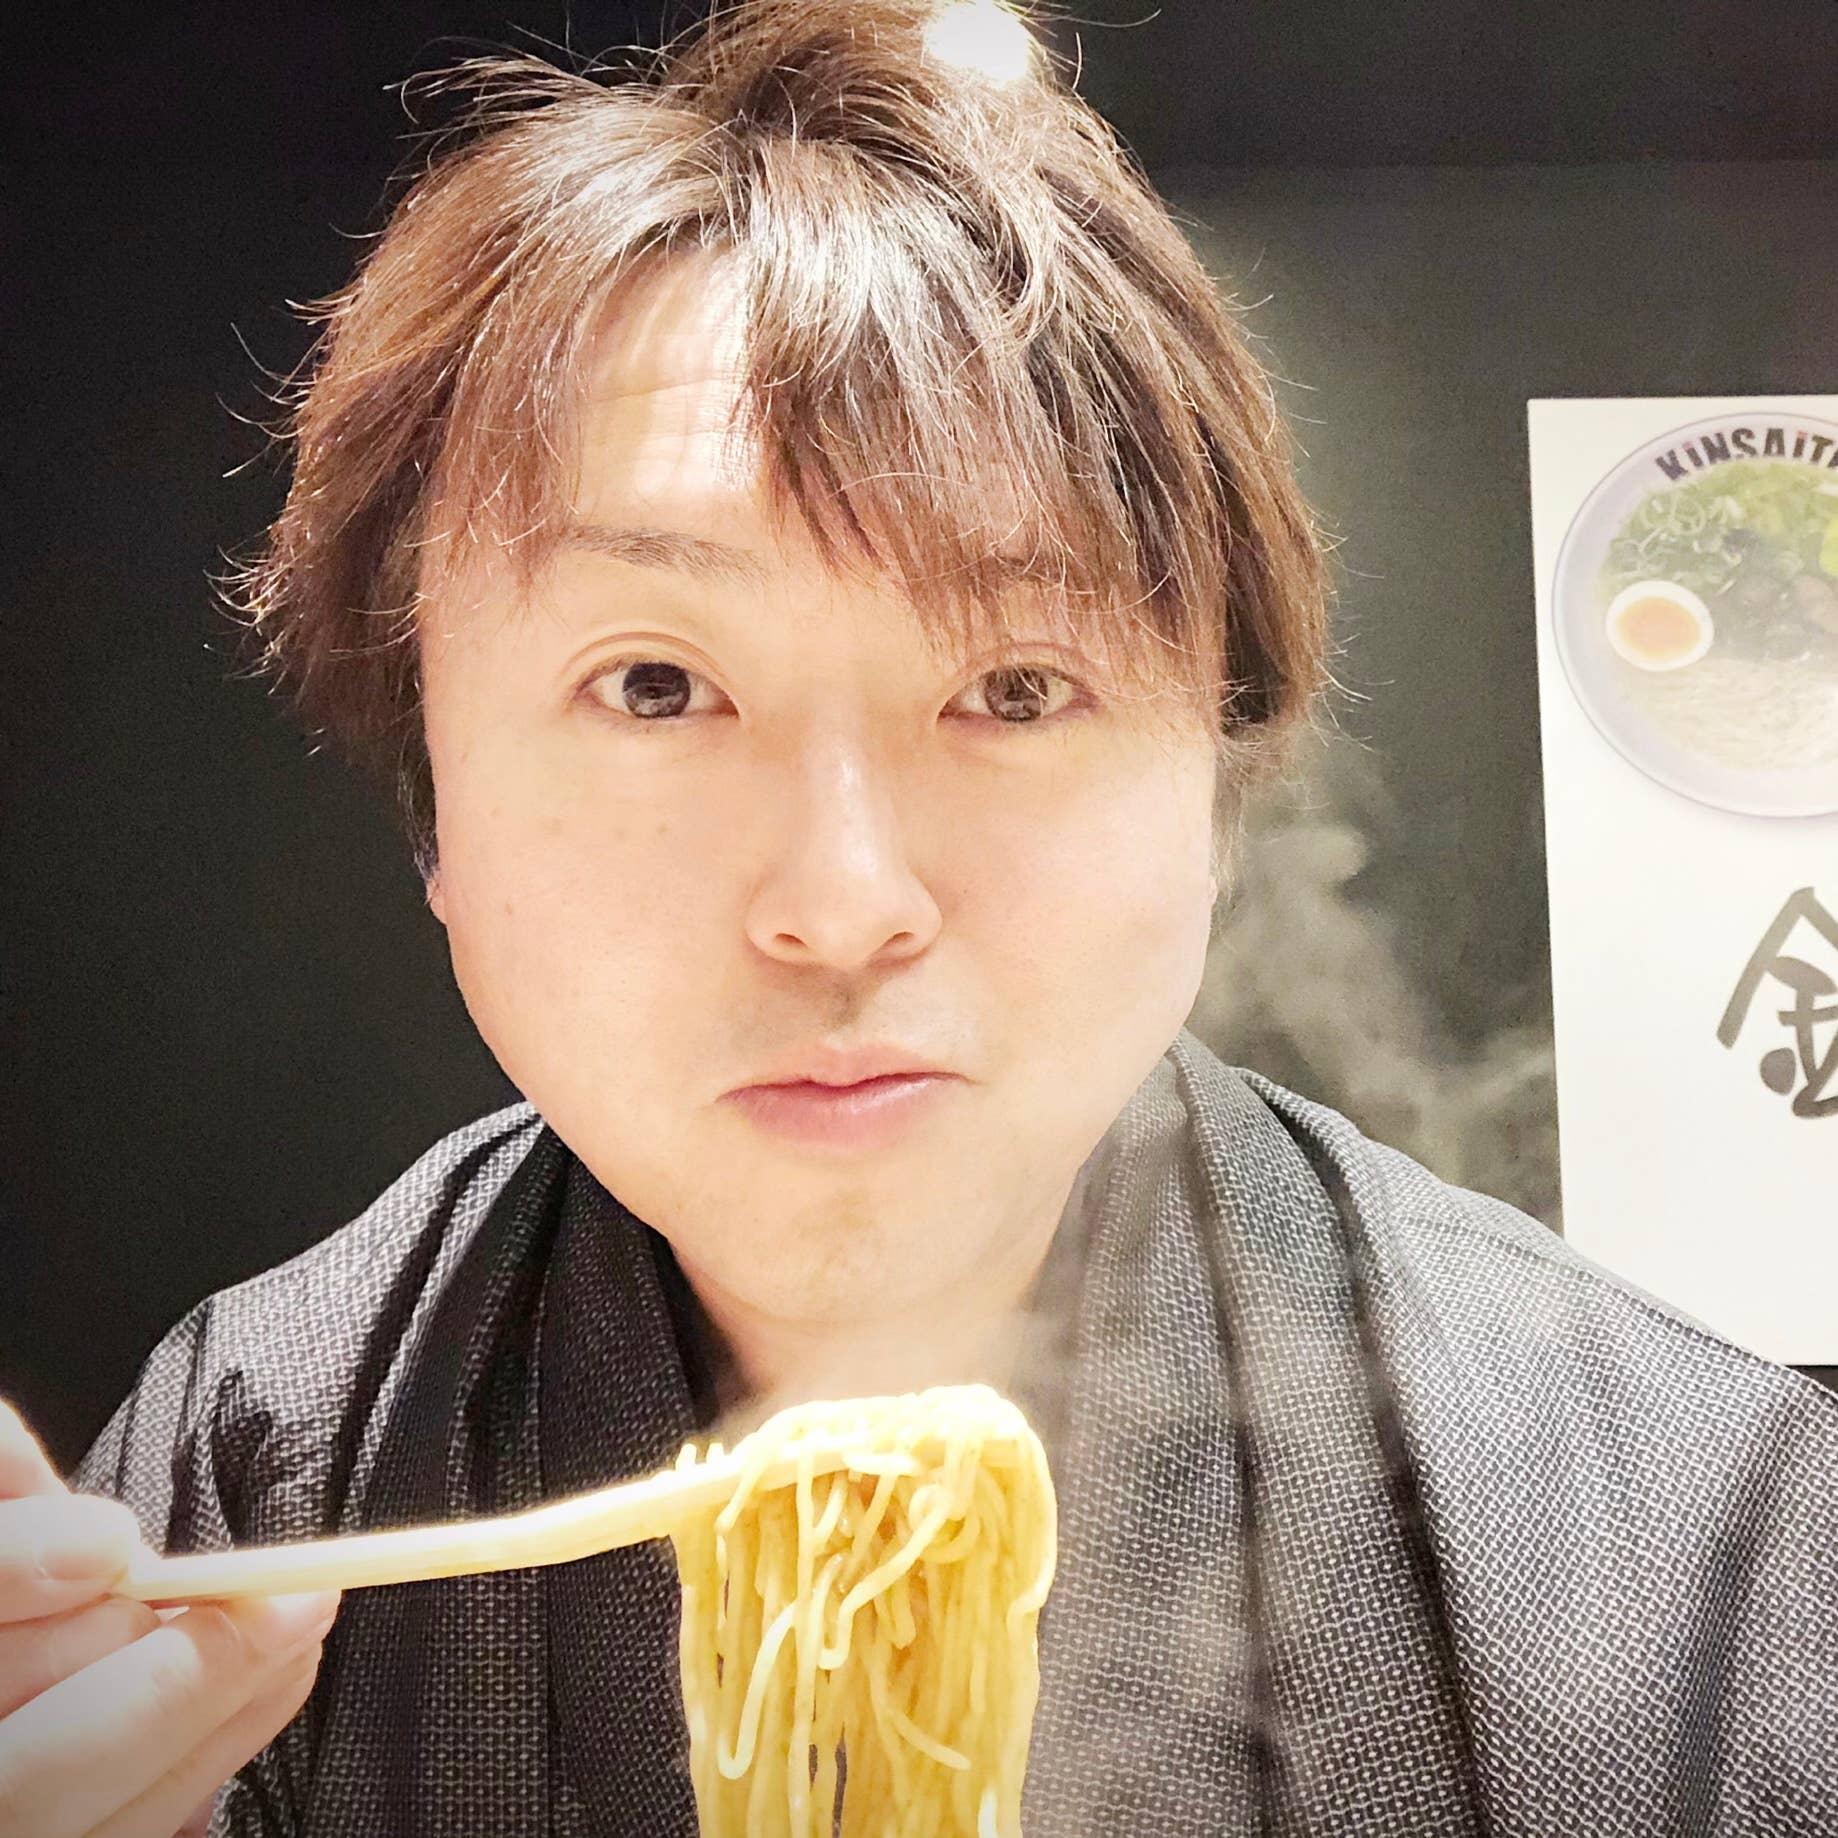 Hiroyuki Kikai